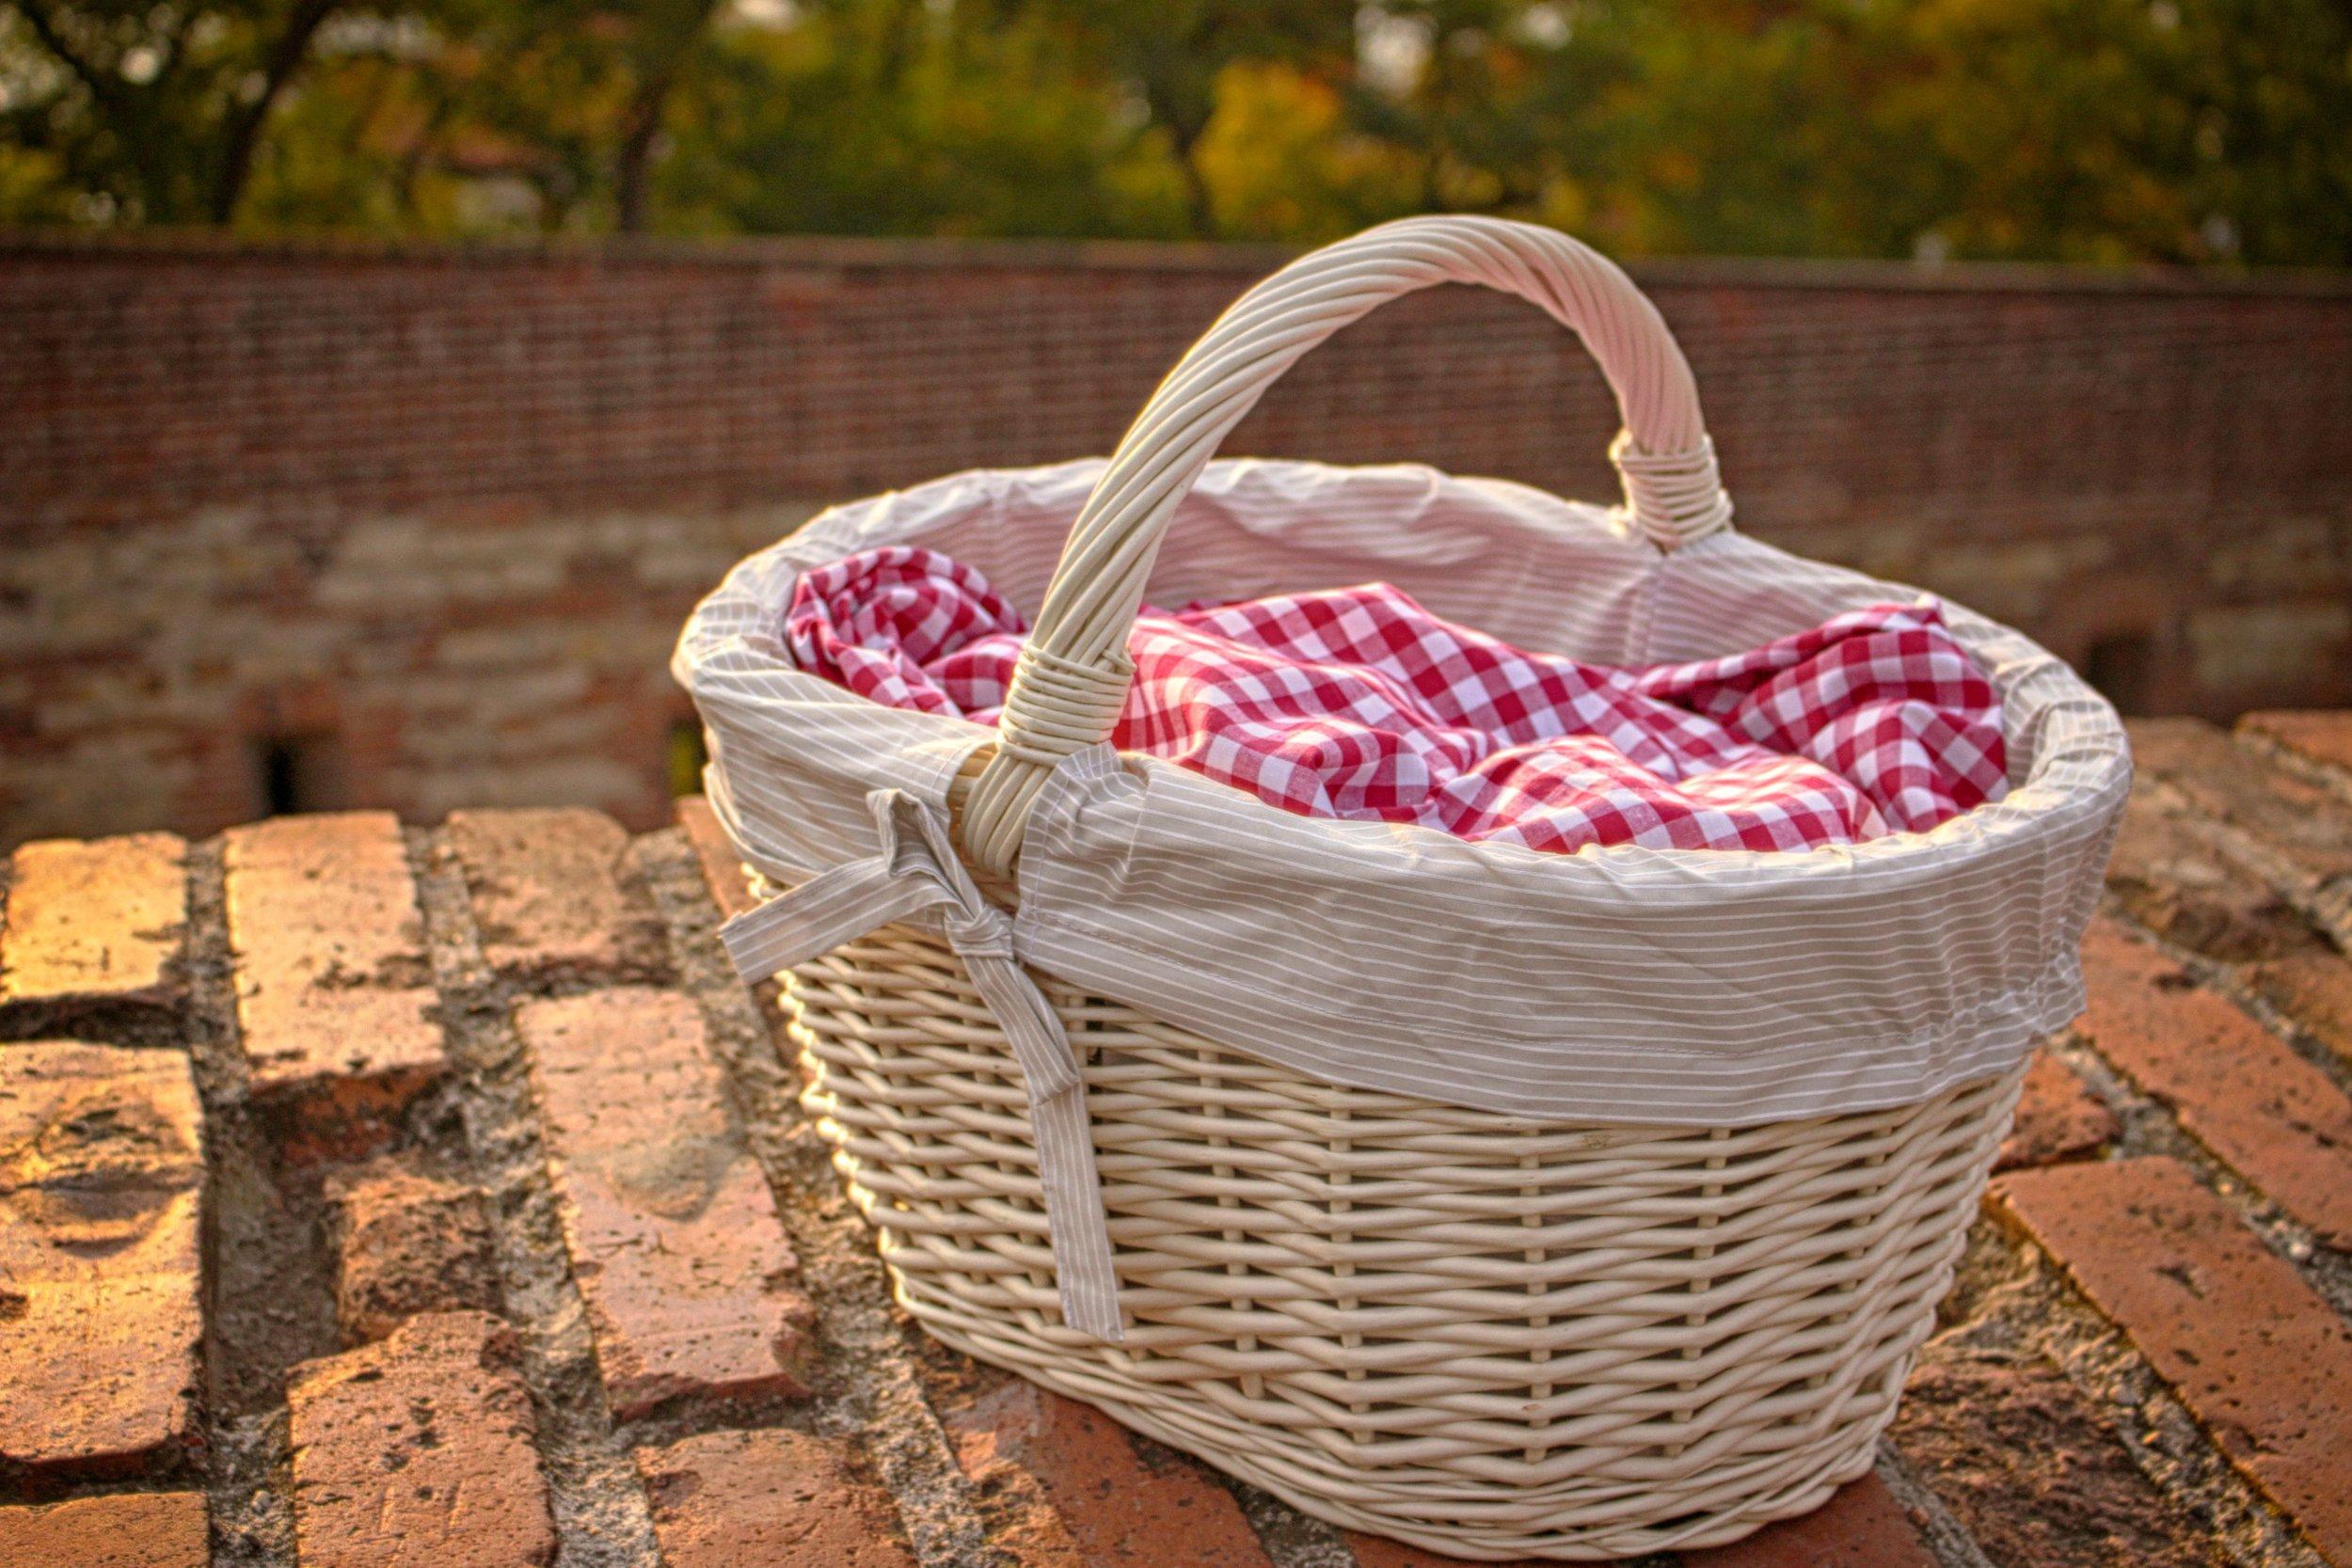 basket-brick-wall-bricks-274050.jpg